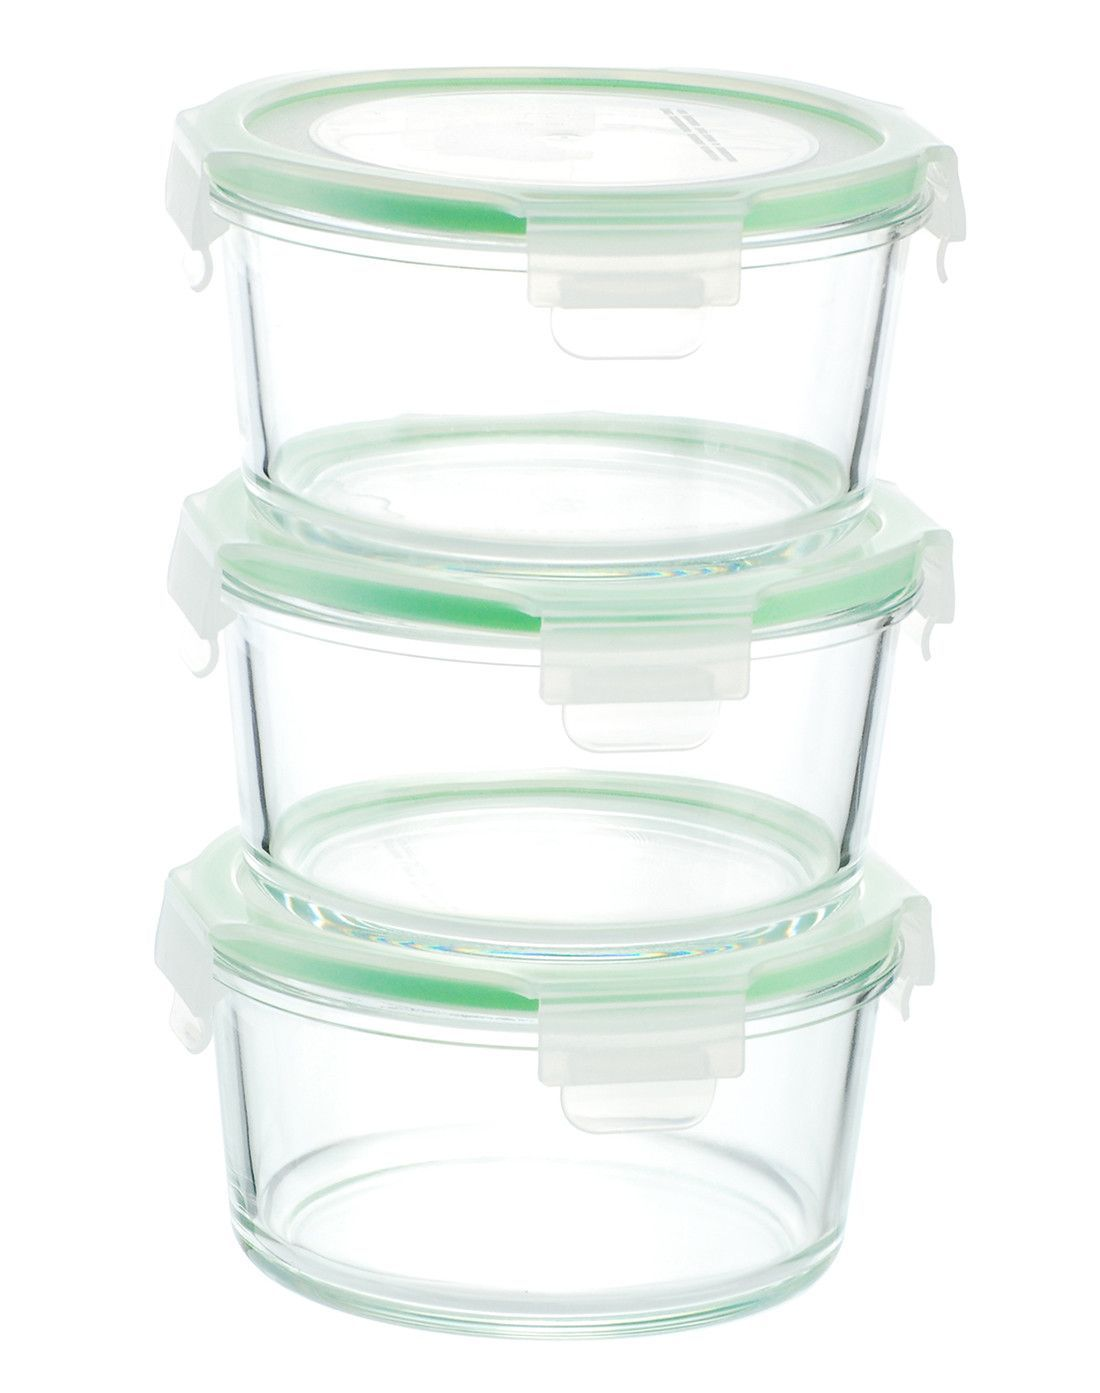 Gogreen Glassworks 3 Container Food Storage Set Food Storage